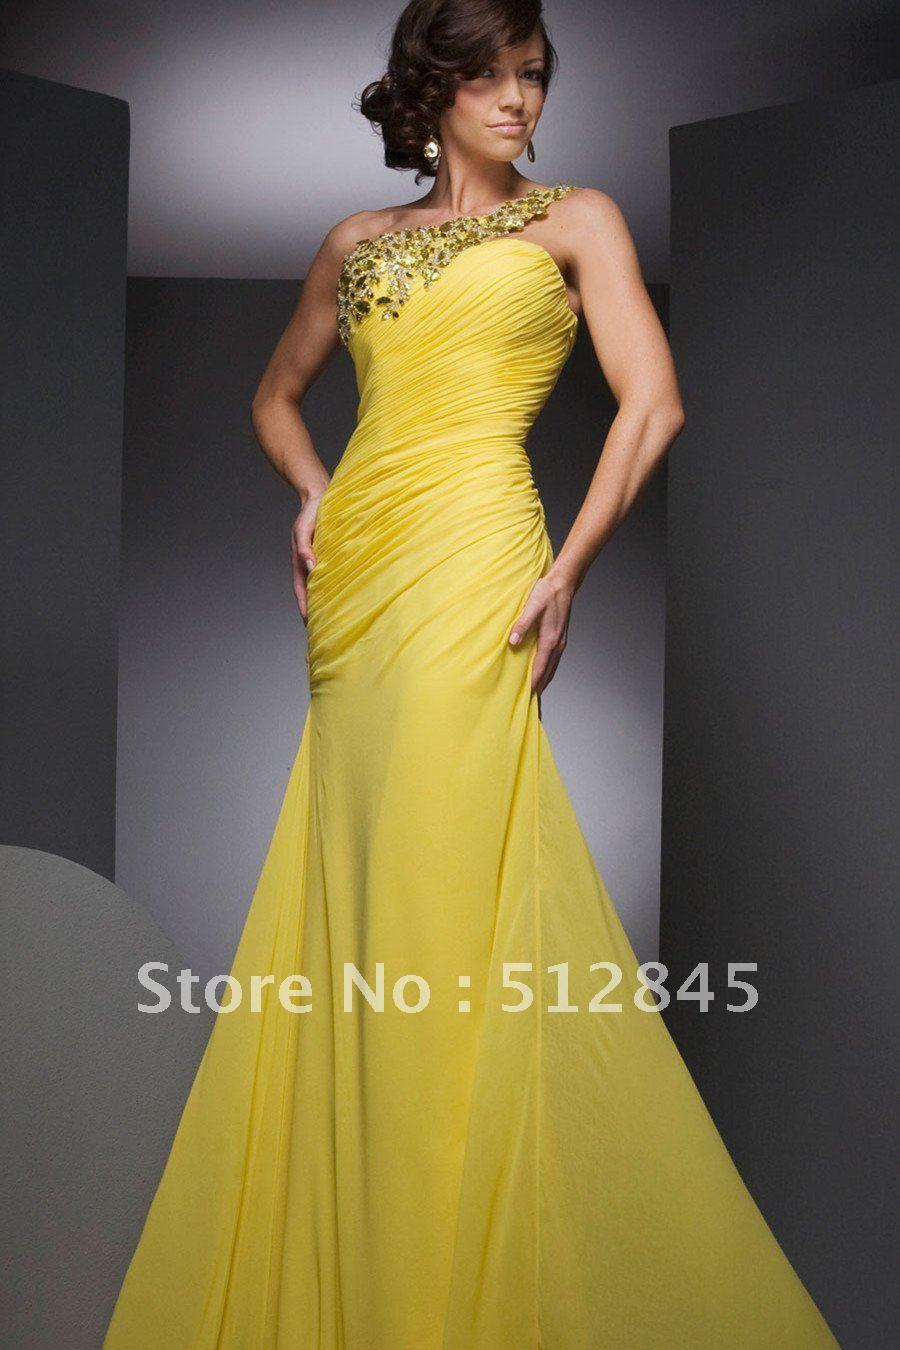 Yellow Dresses For Weddings Photo Album - Weddings Pro